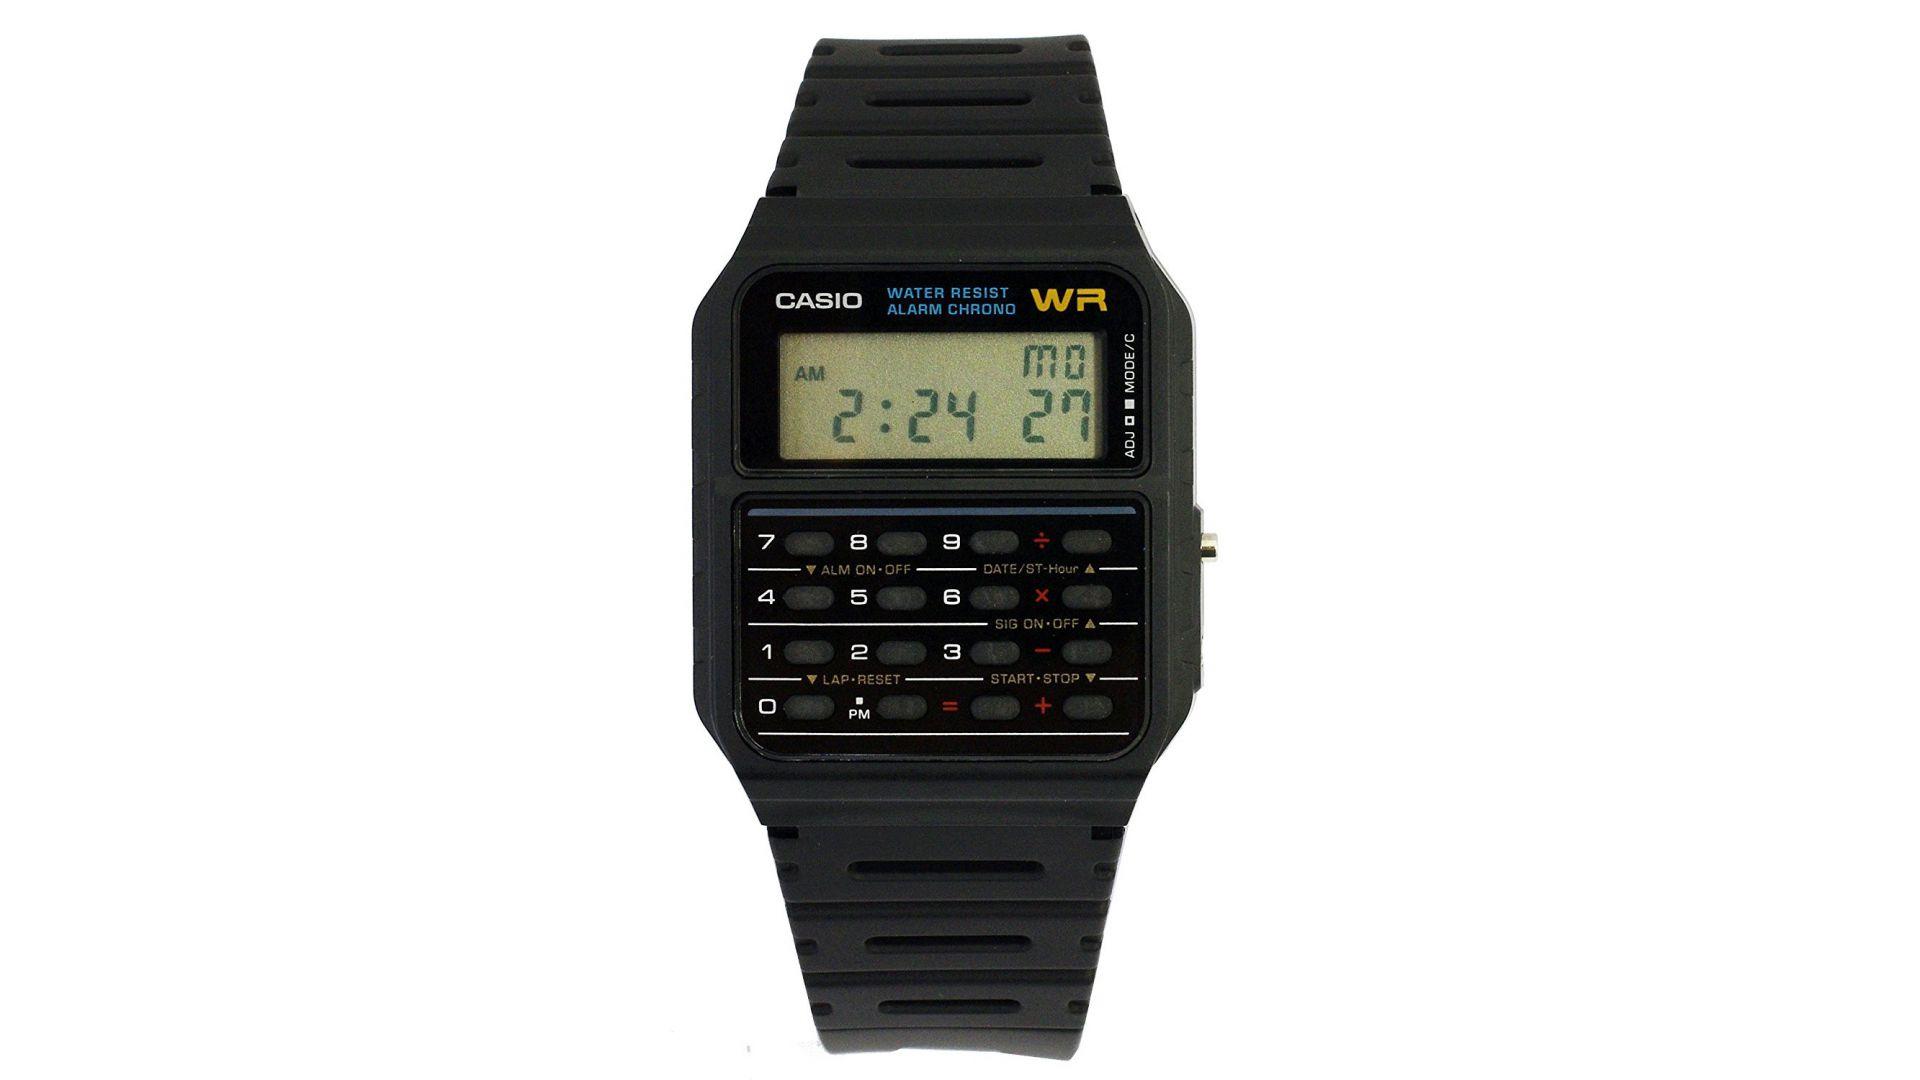 6db5ac692 ساعات كاسيو الرقمية 2018 تجسد مجد قياس الزمن | مجلة الرجل